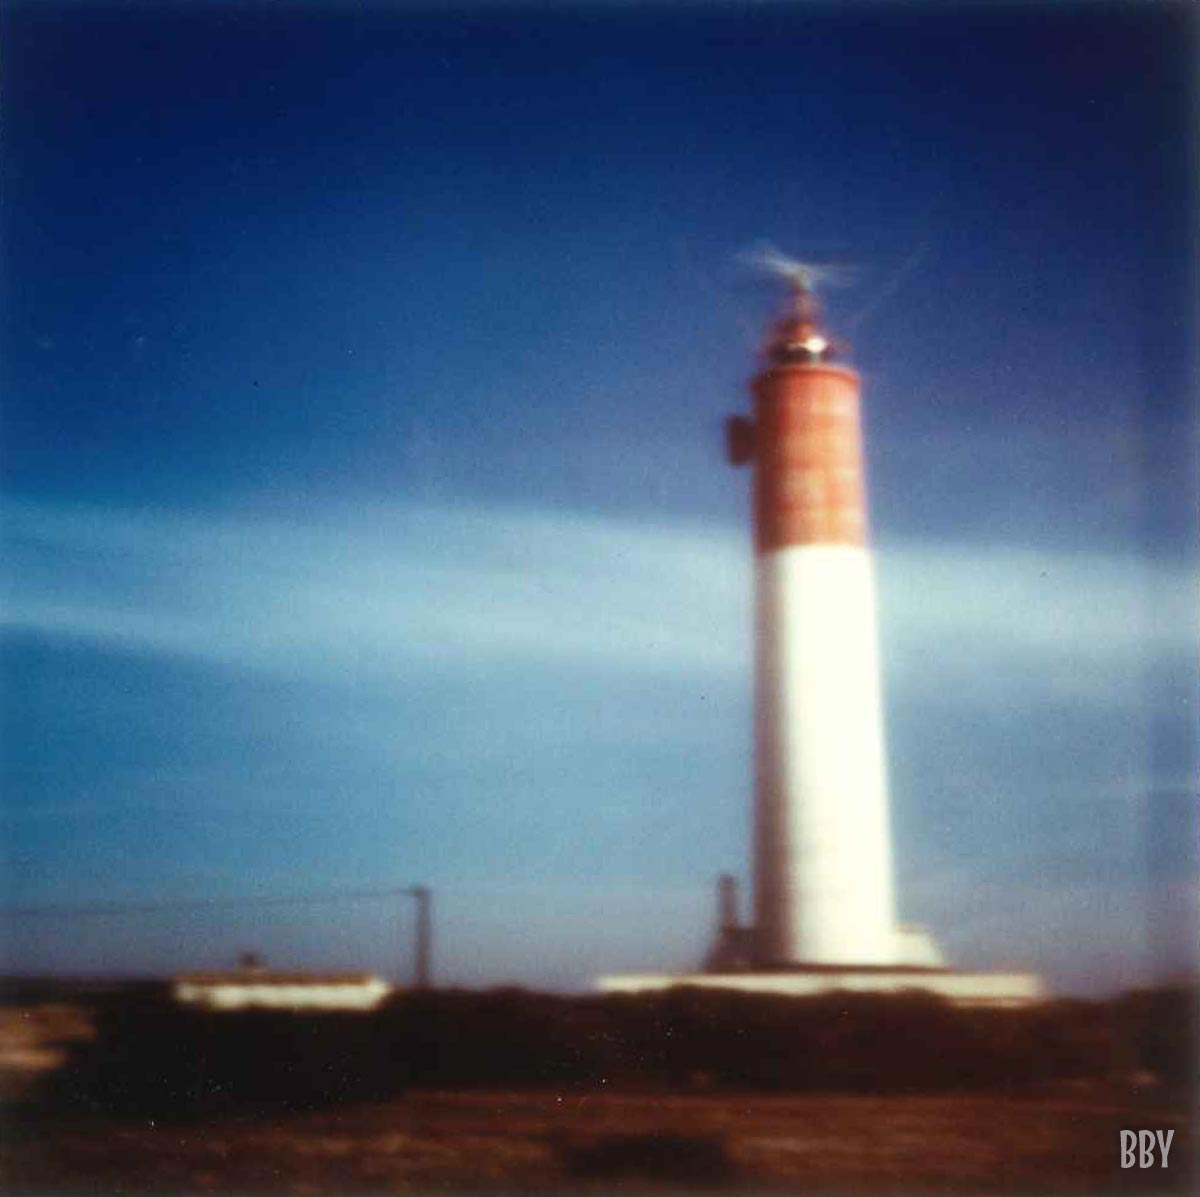 stenope, pinhole, slow photography, chambre noire, phare, lighthouse, cap couronne, cote bleue